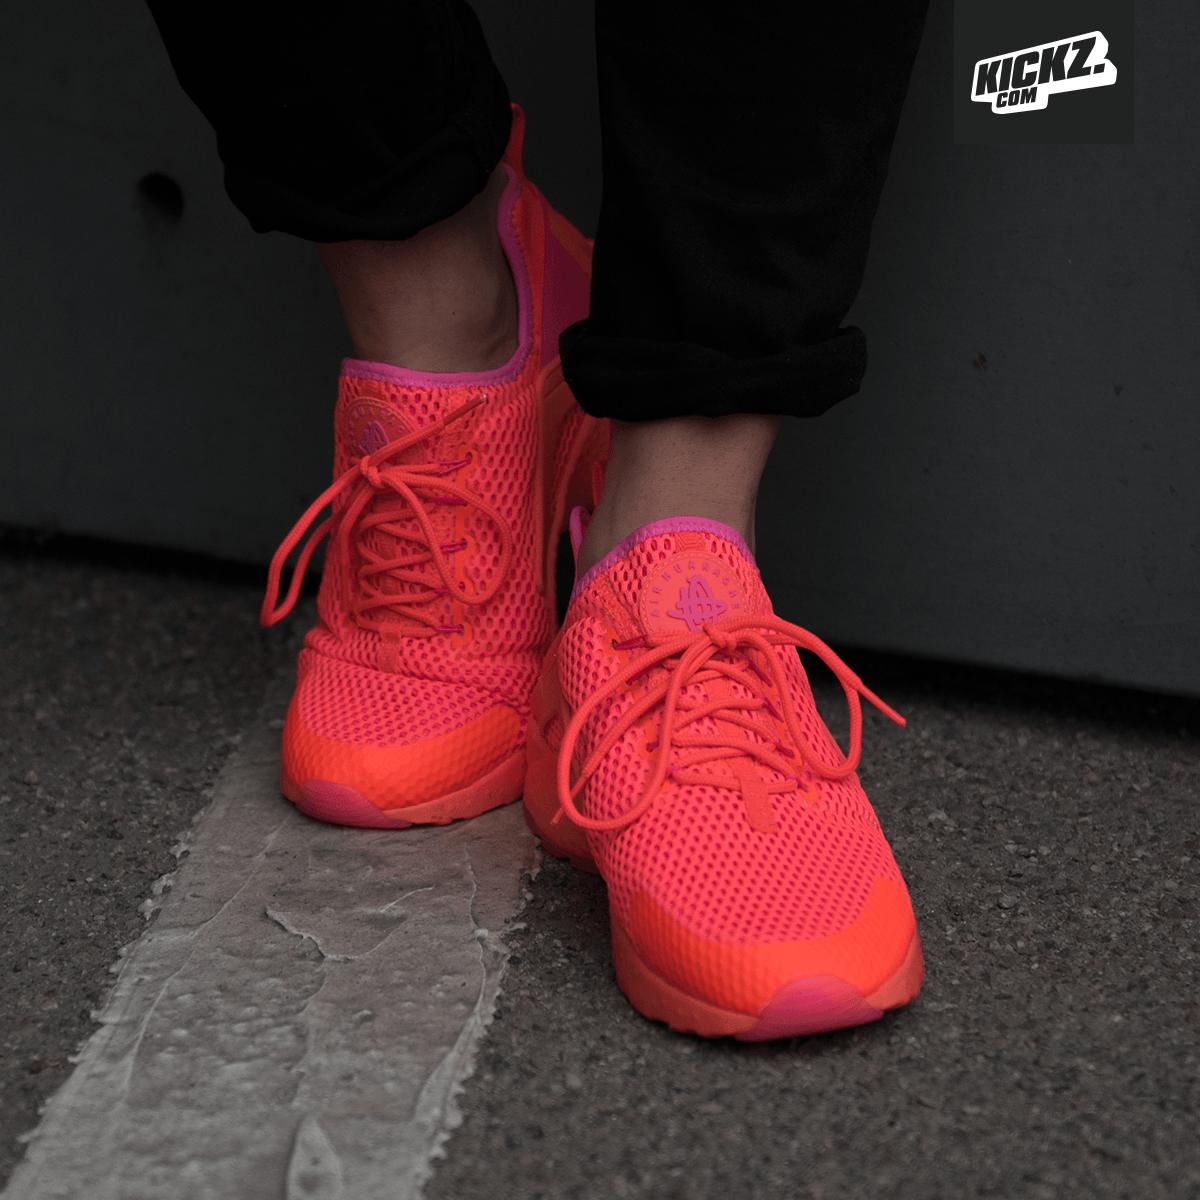 ca4bbfda0425 Nike Air Huarache Run Ultra BR